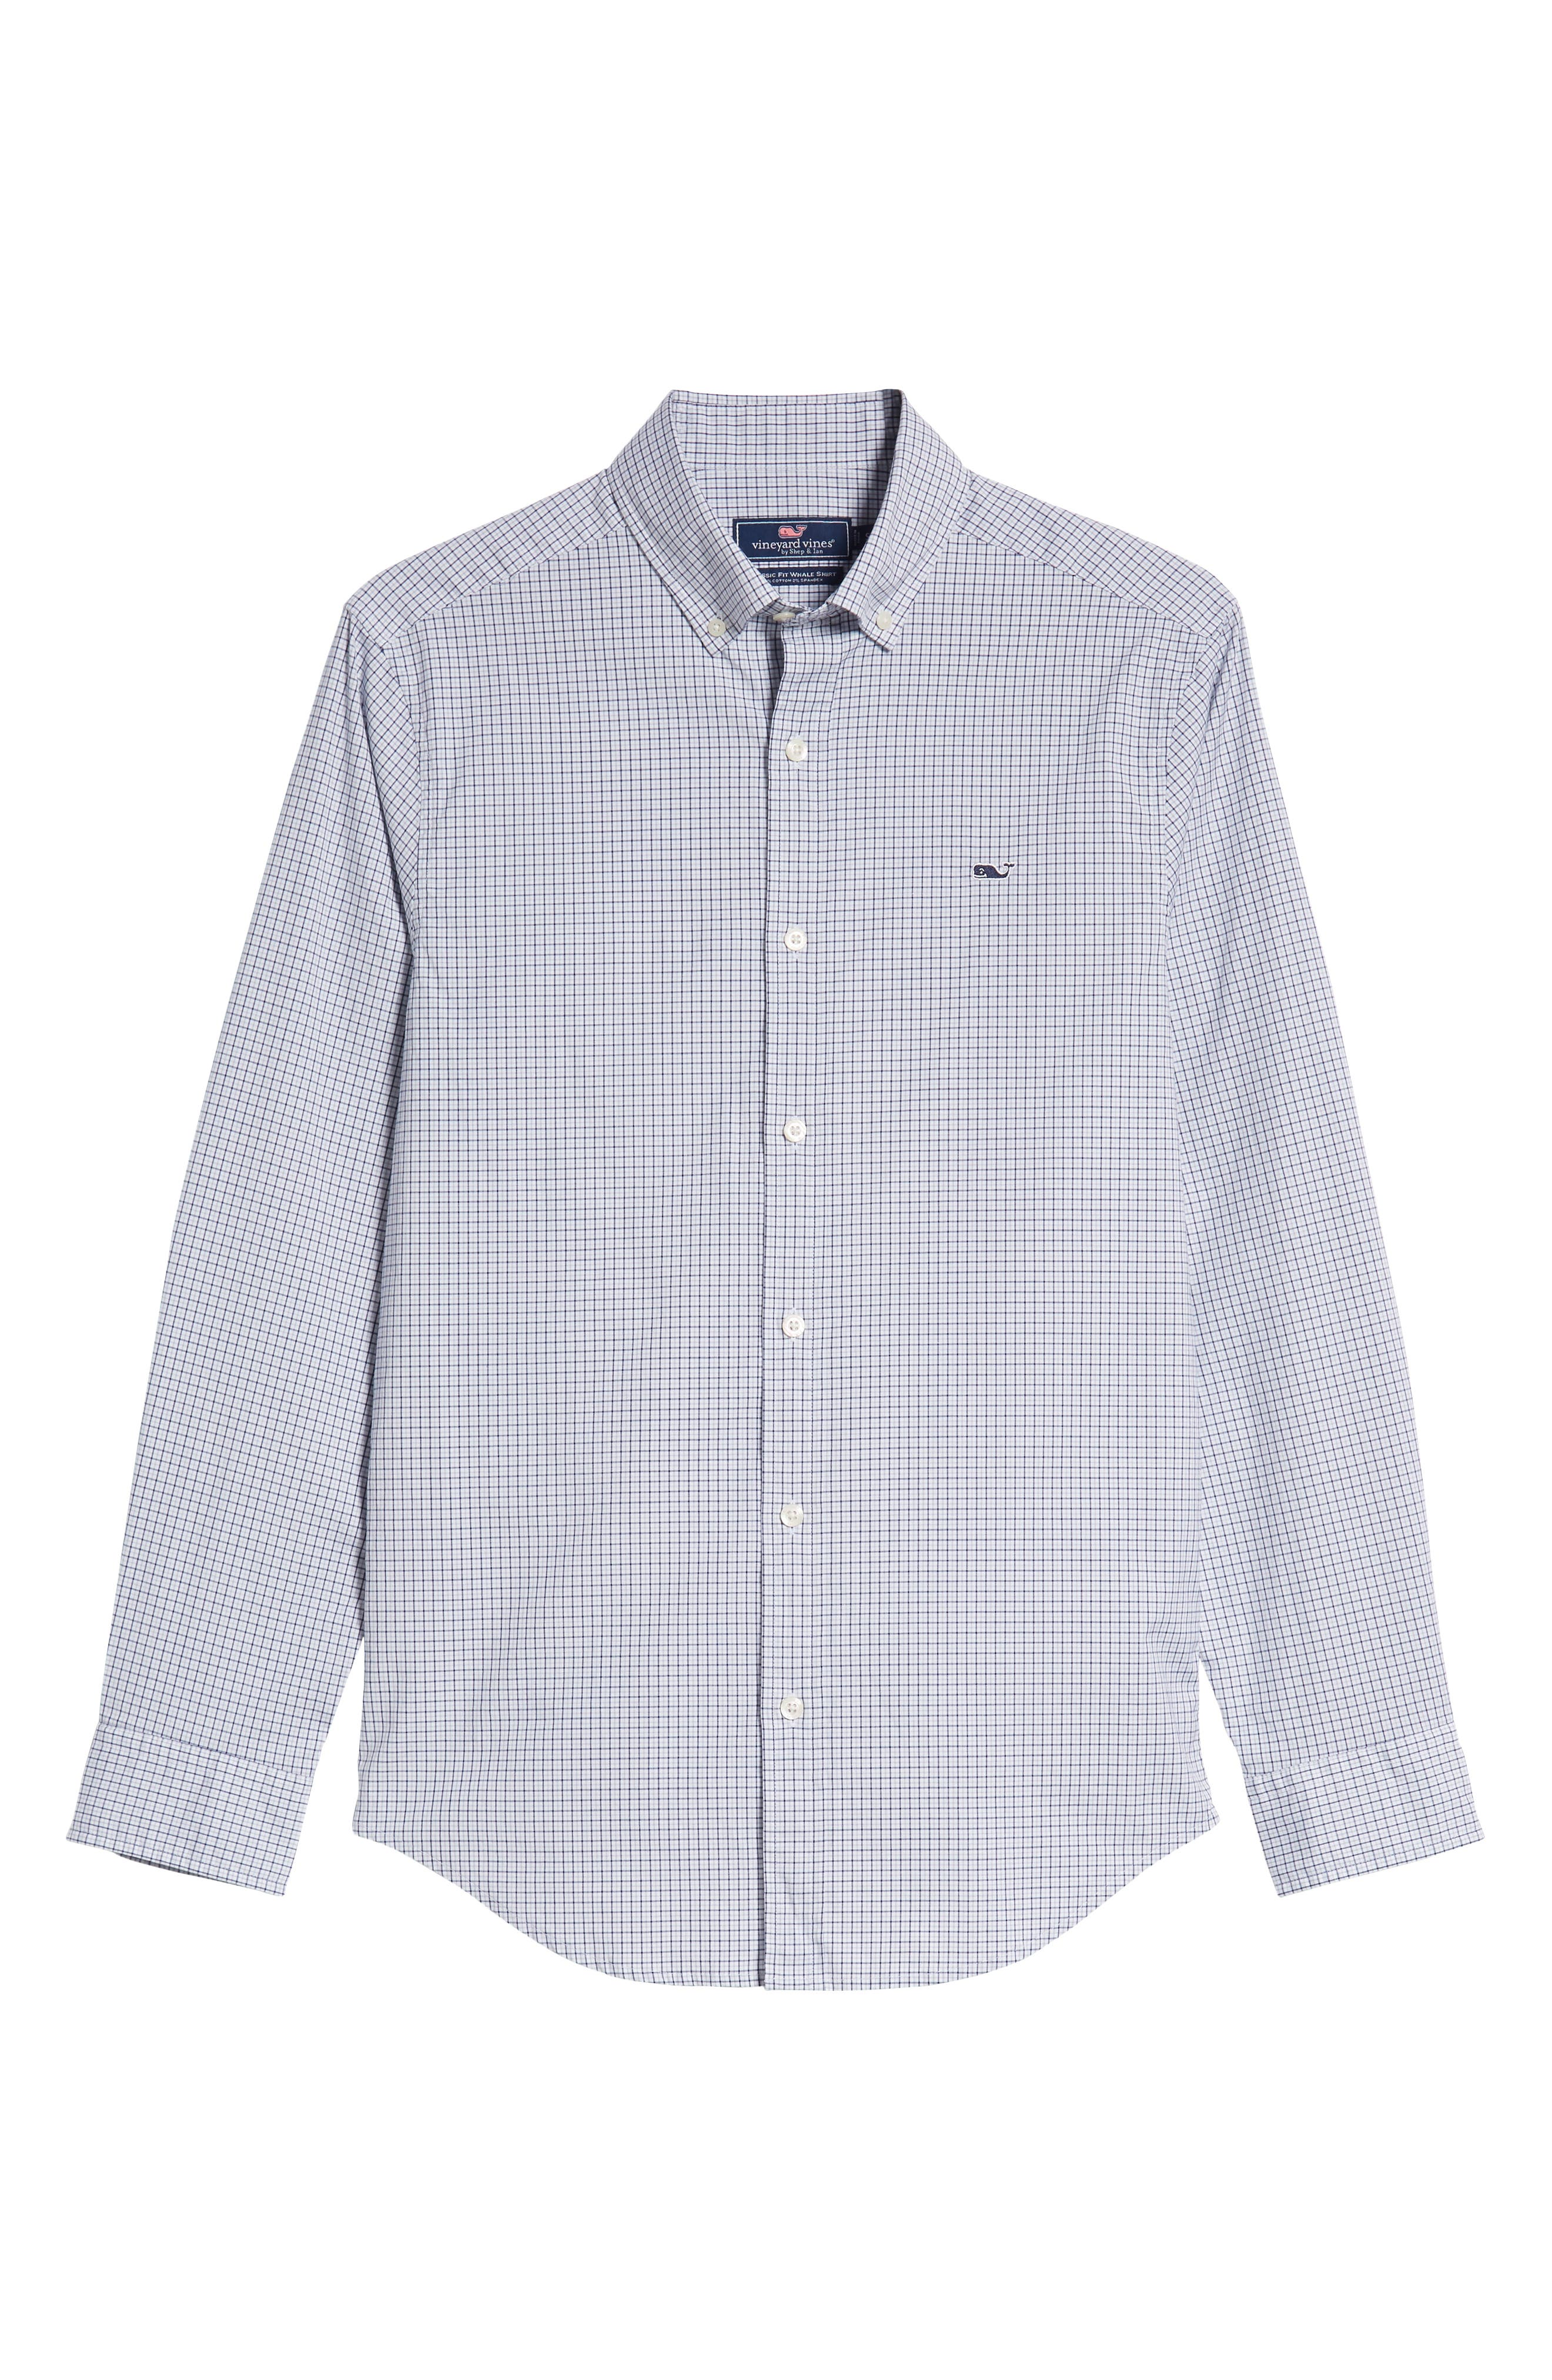 Beechcroft Regular Fit Check Sport Shirt,                             Alternate thumbnail 5, color,                             034